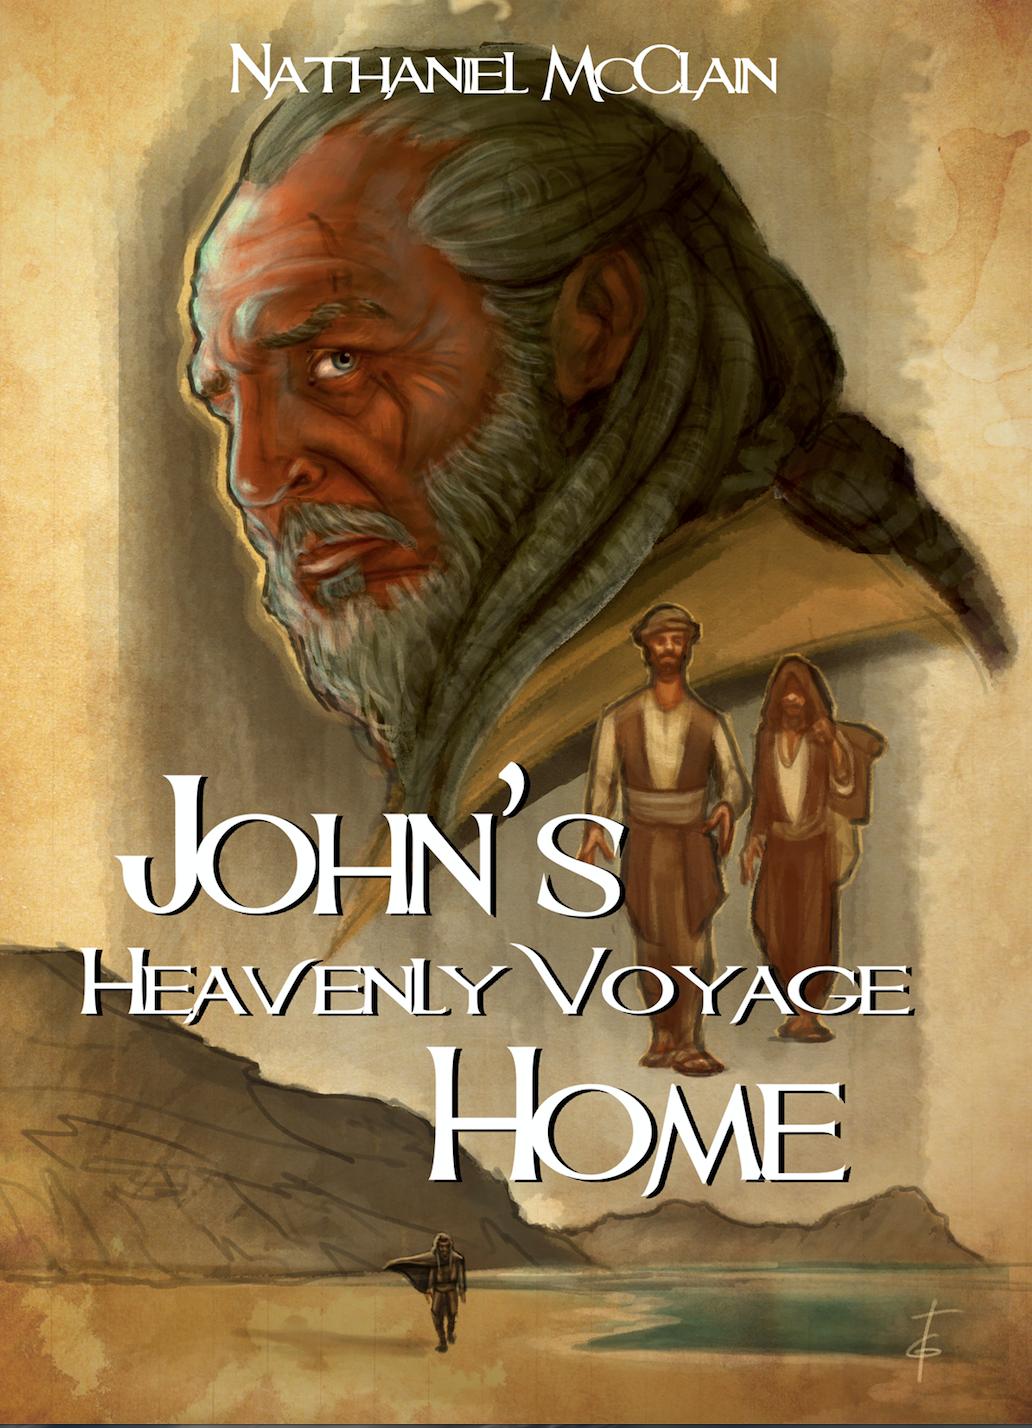 John Heavenly Voyage Home